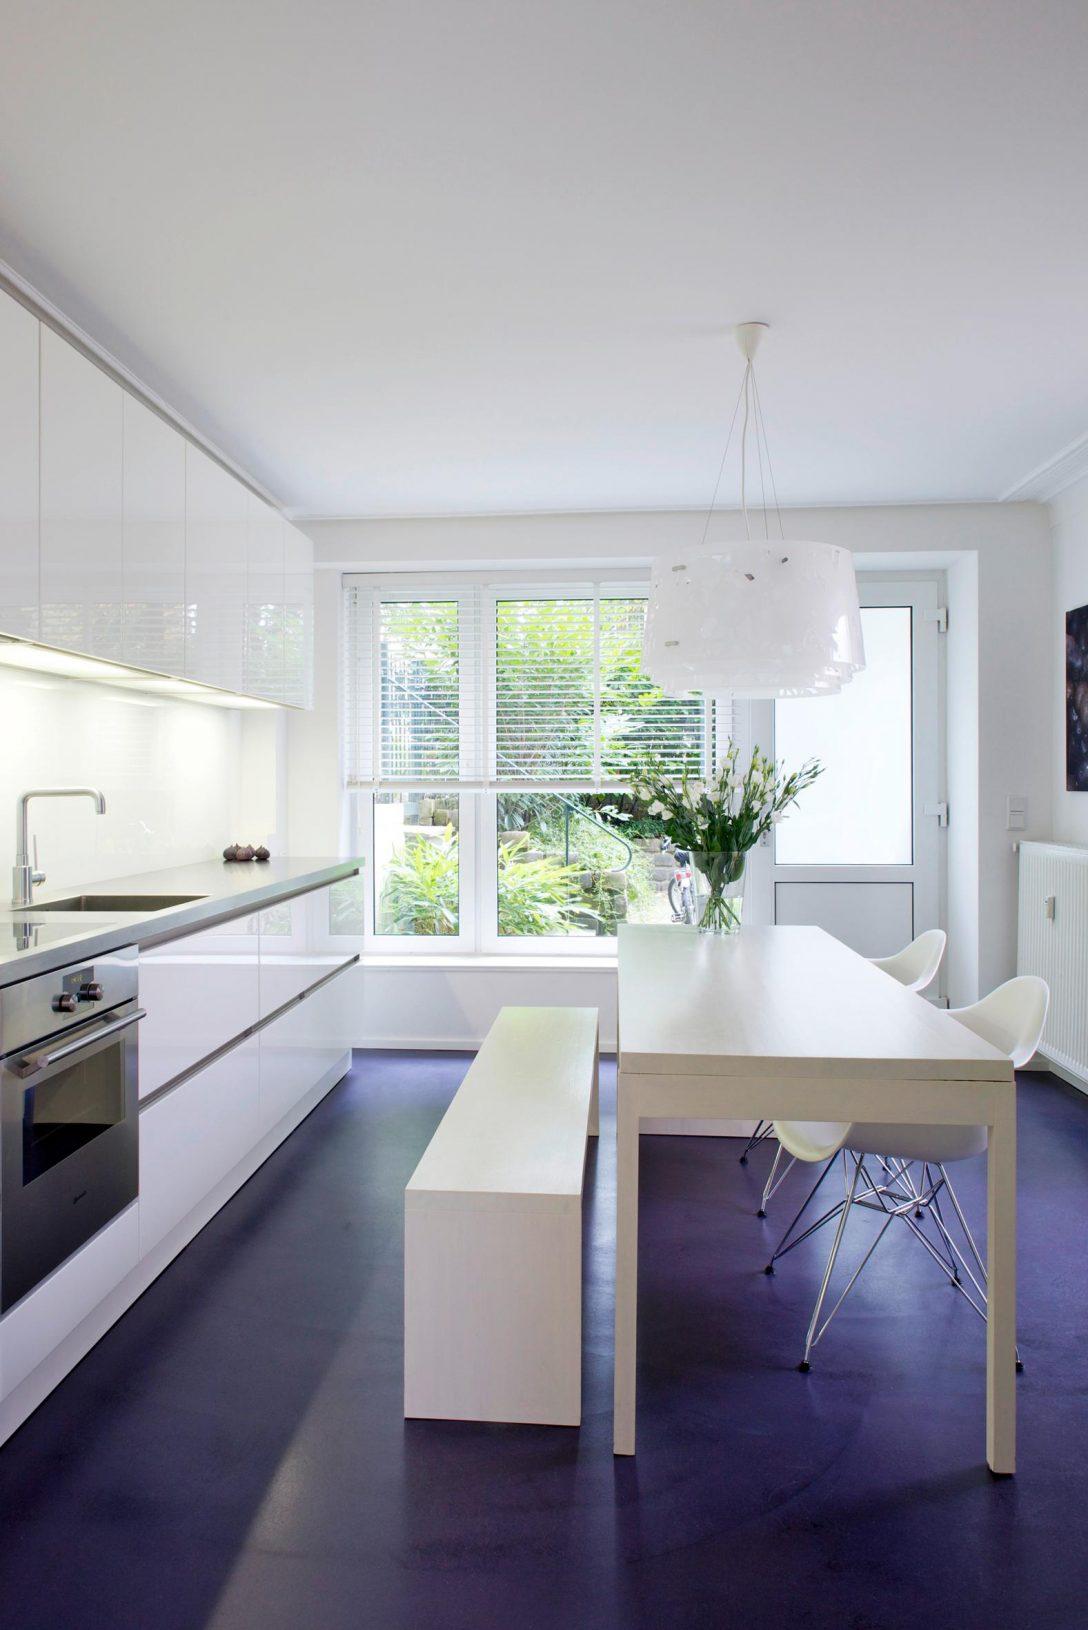 Large Size of Bodenbelag Küche Erneuern Bodenbelag Küche Grau Pvc Boden Küche Obi Bodenbelag Küche Vinyl Bauhaus Küche Bodenbelag Küche